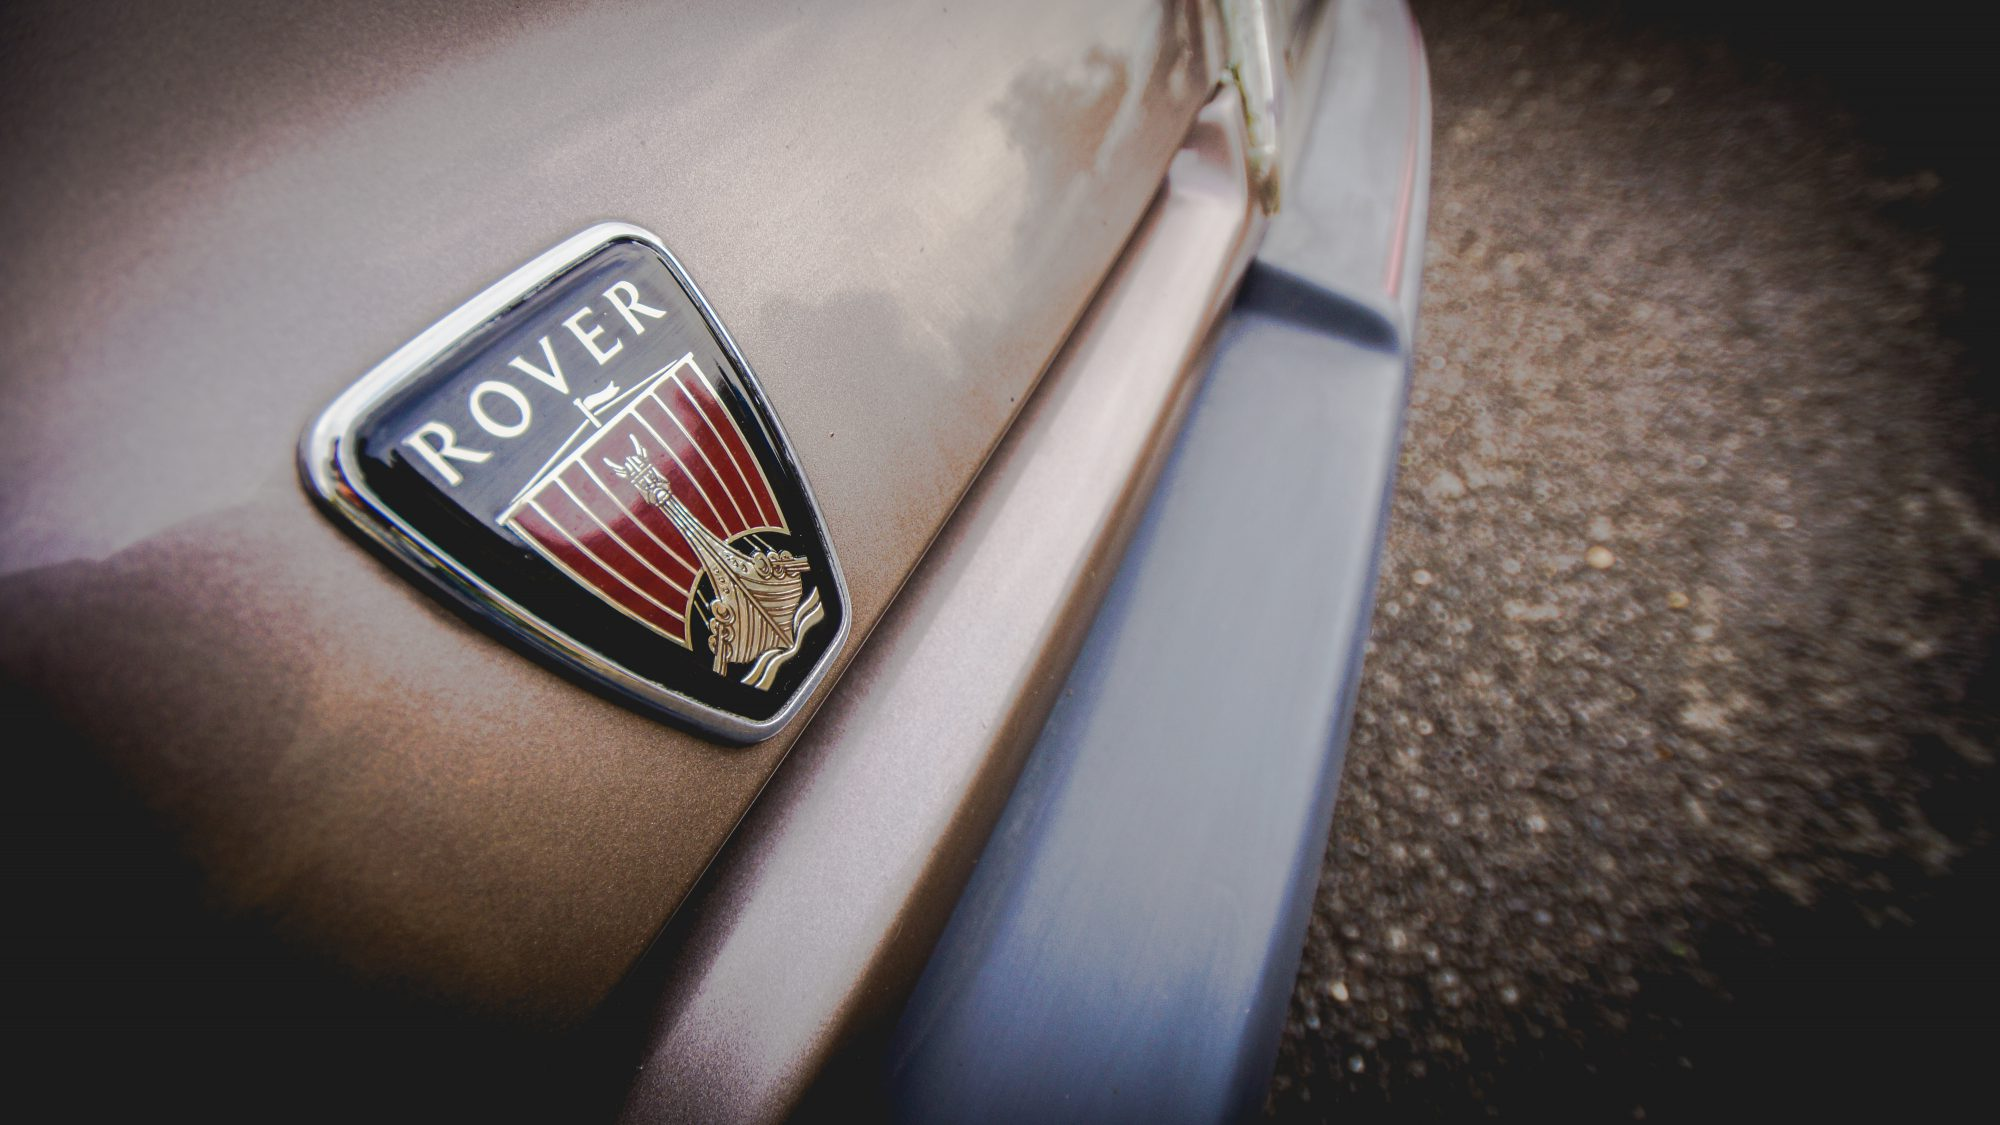 Rover, Rover 200, Rover 400, Rover R8, R8, 200, 400, Rover R8 Launch, Rover 200 and 400 Owner's Club, classic car, retro car, motoring, automotive, carandclassic, carandclassic.co.uk